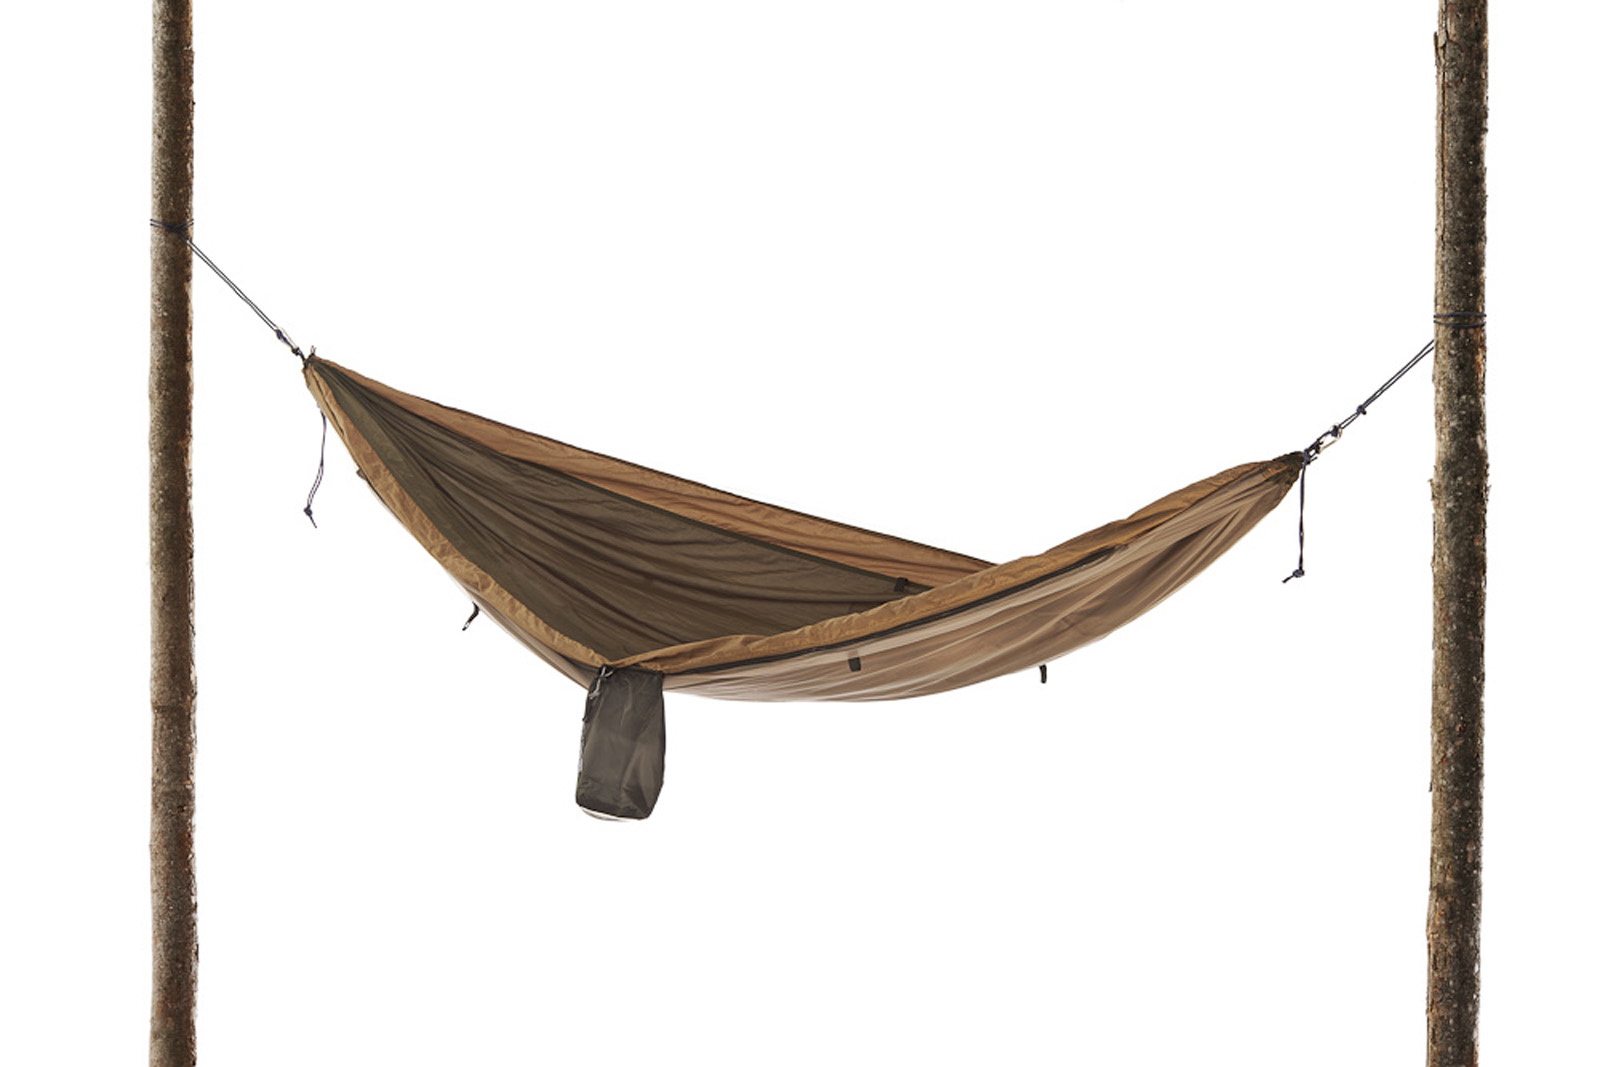 Grand Trunk Skeeter Beeter Pro Hammock Outdoor Camping